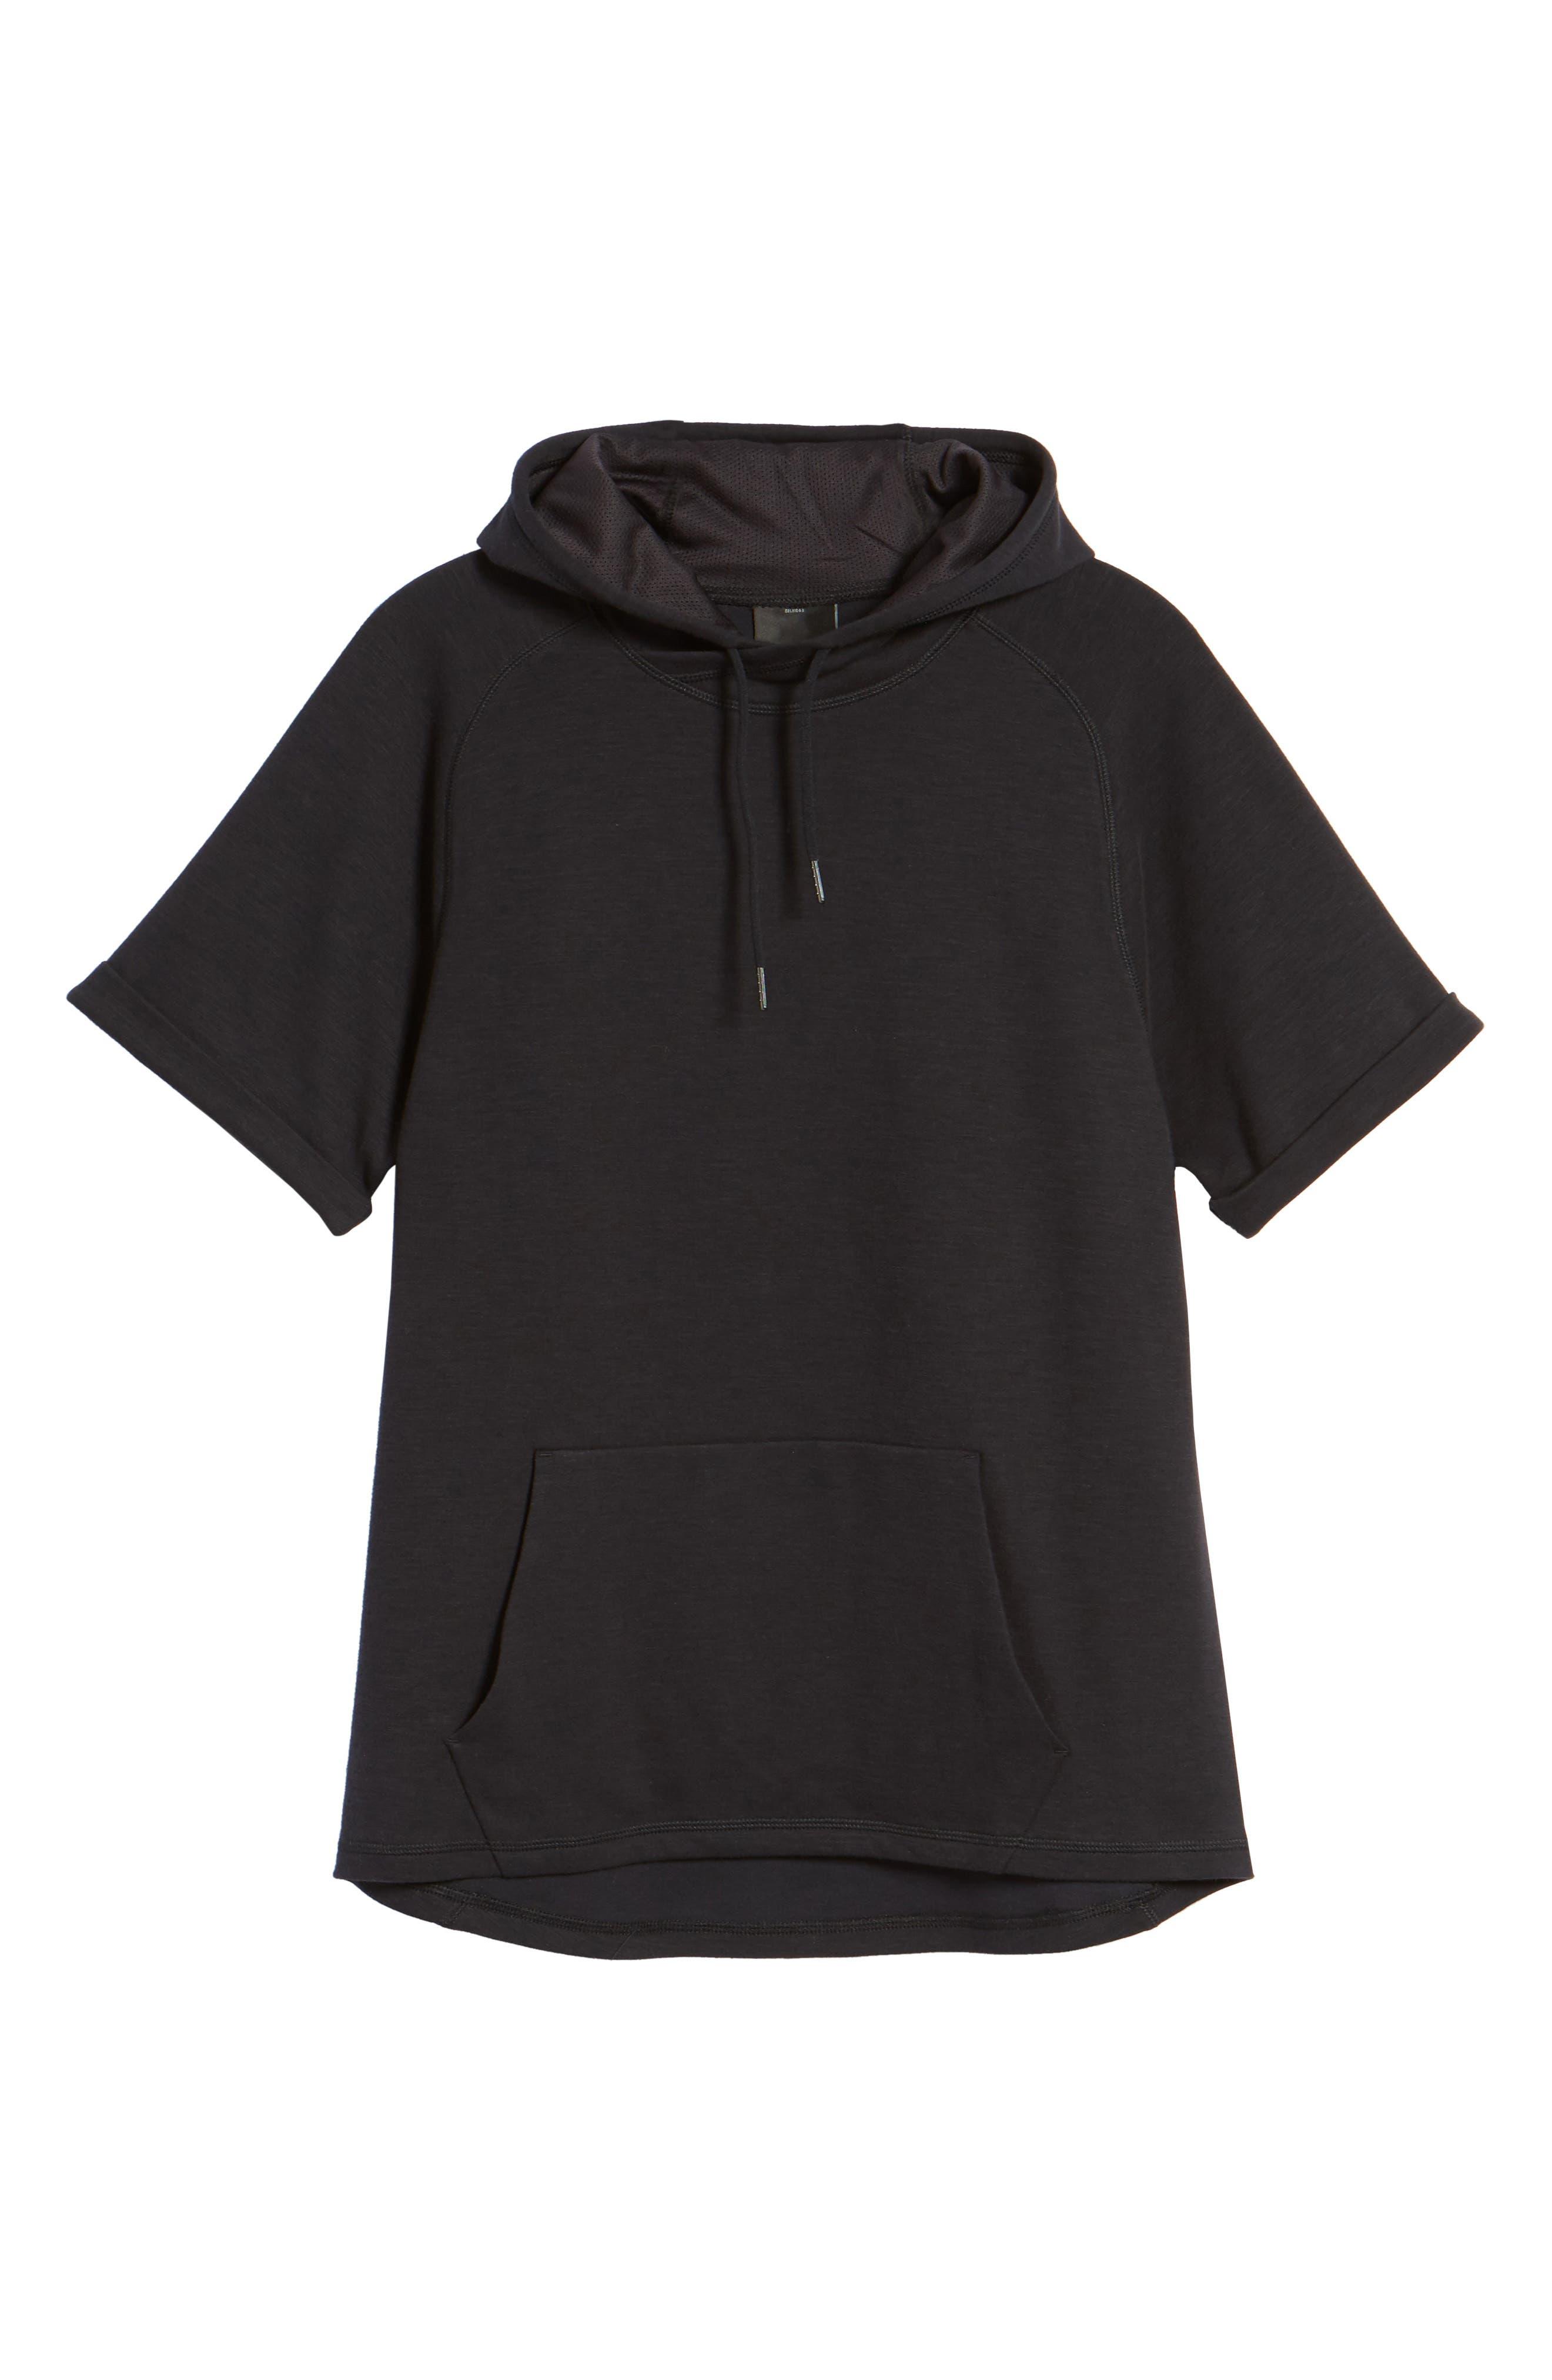 Magnetite Short Sleeve Cotton Blend Hoodie,                             Alternate thumbnail 6, color,                             Black Oxide Melange